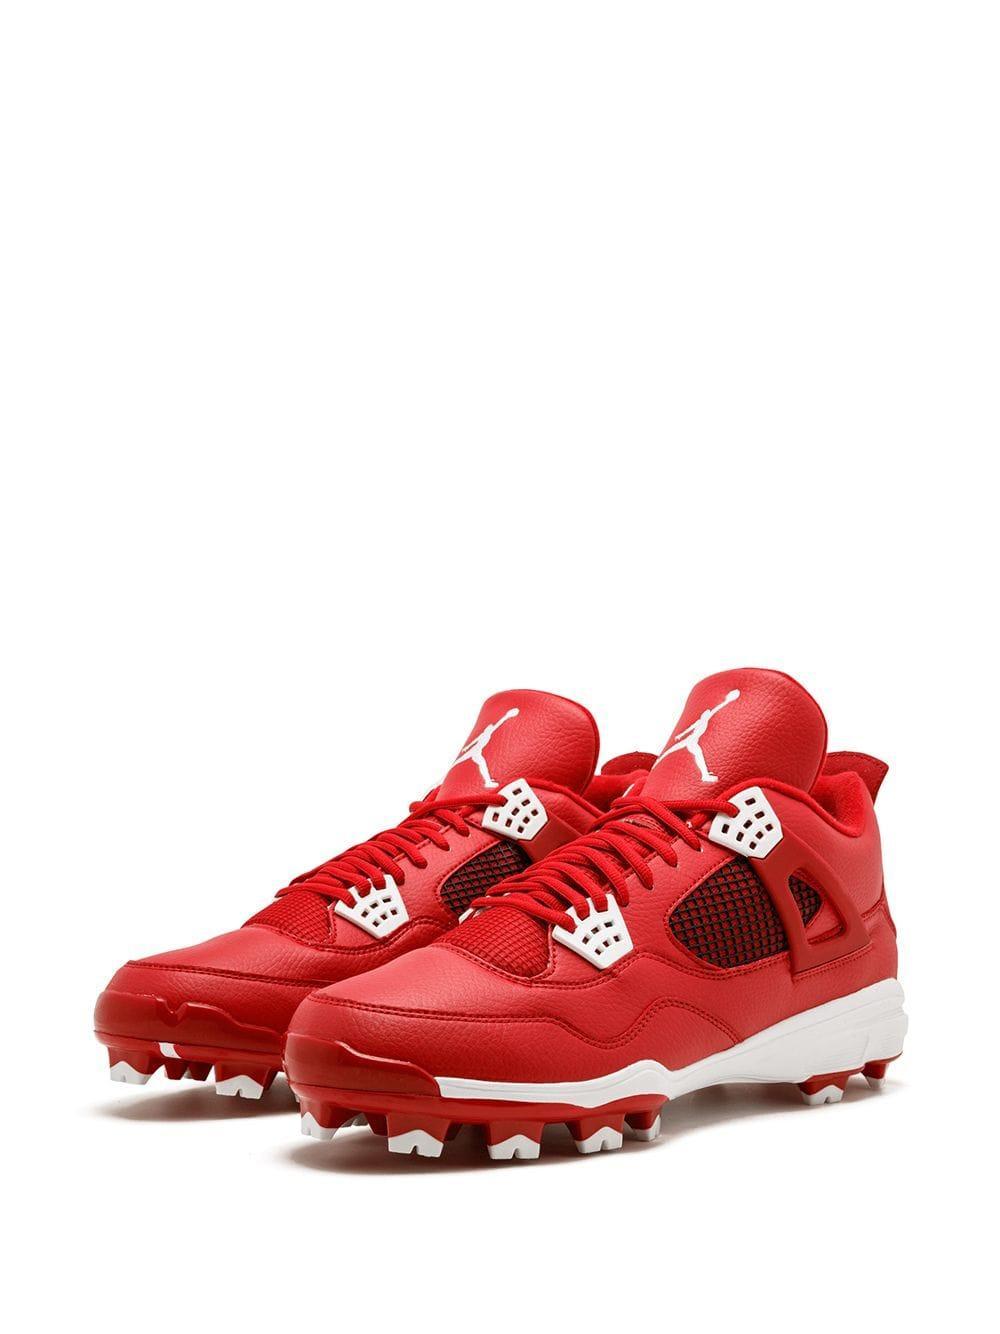 5f7a87dd Nike - Red 4 Retro Mcs Sneakers for Men - Lyst. View fullscreen